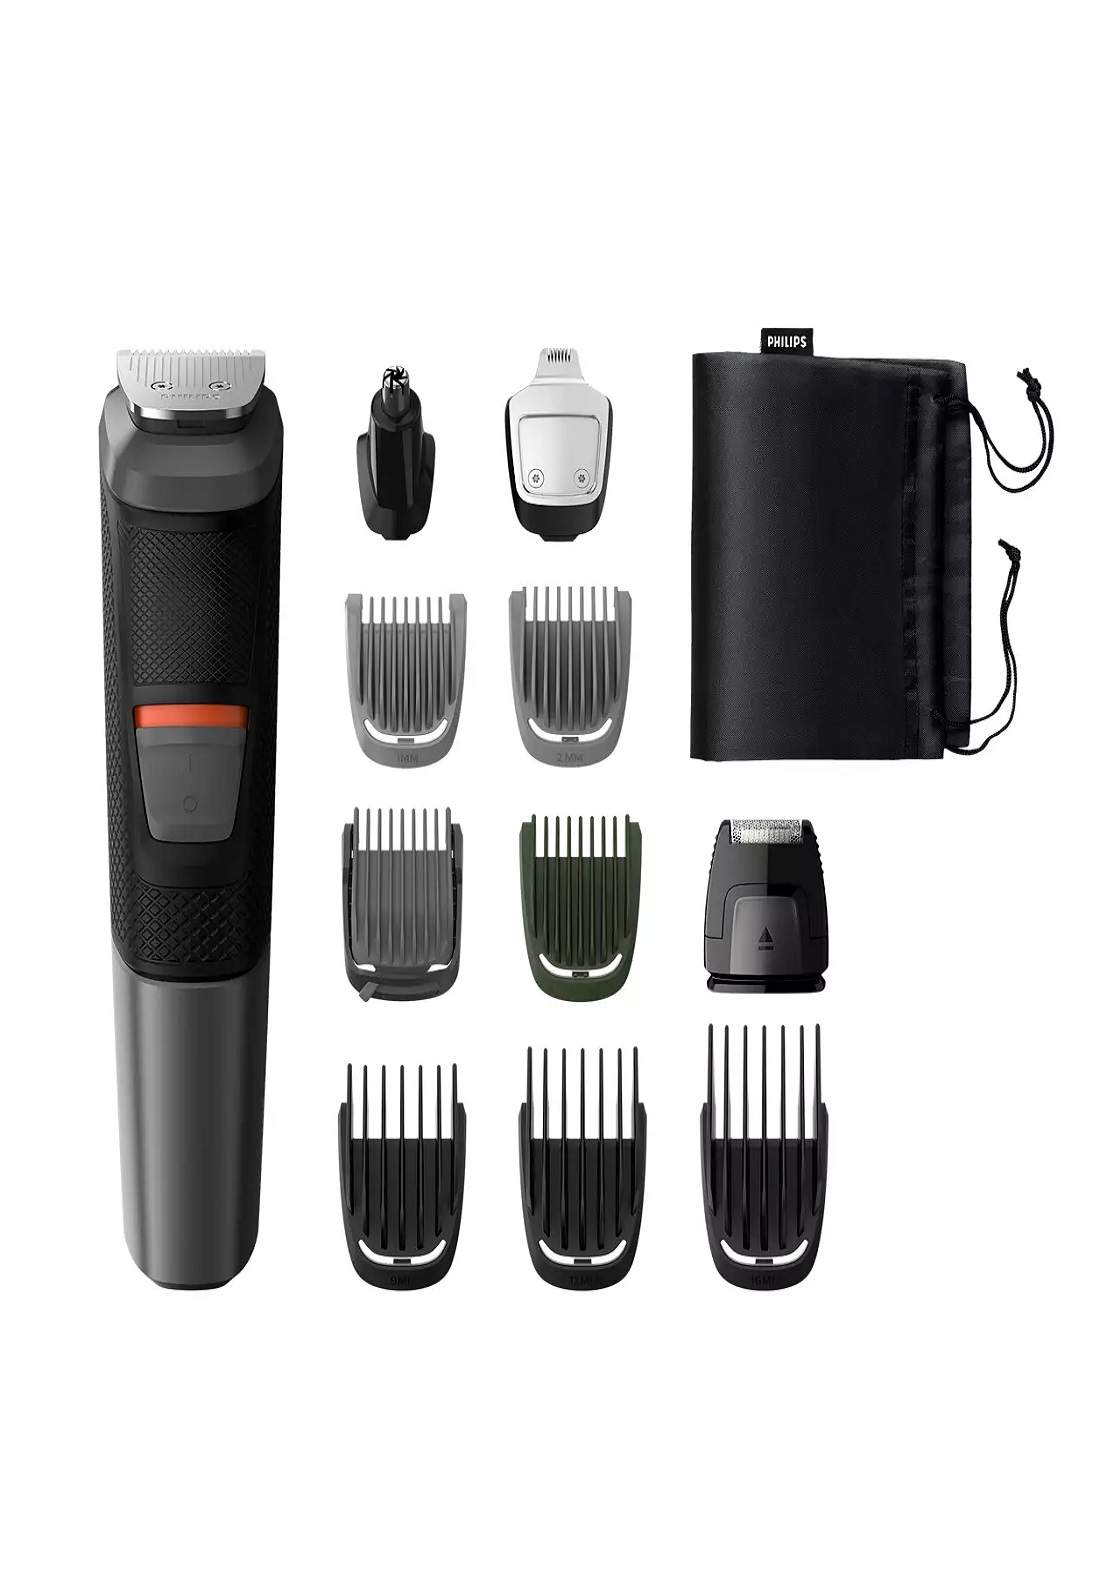 Philips MG5730 11-in-1 All-In-One Trimmer Shaver For Men Black ماكنة حلاقة رجالية